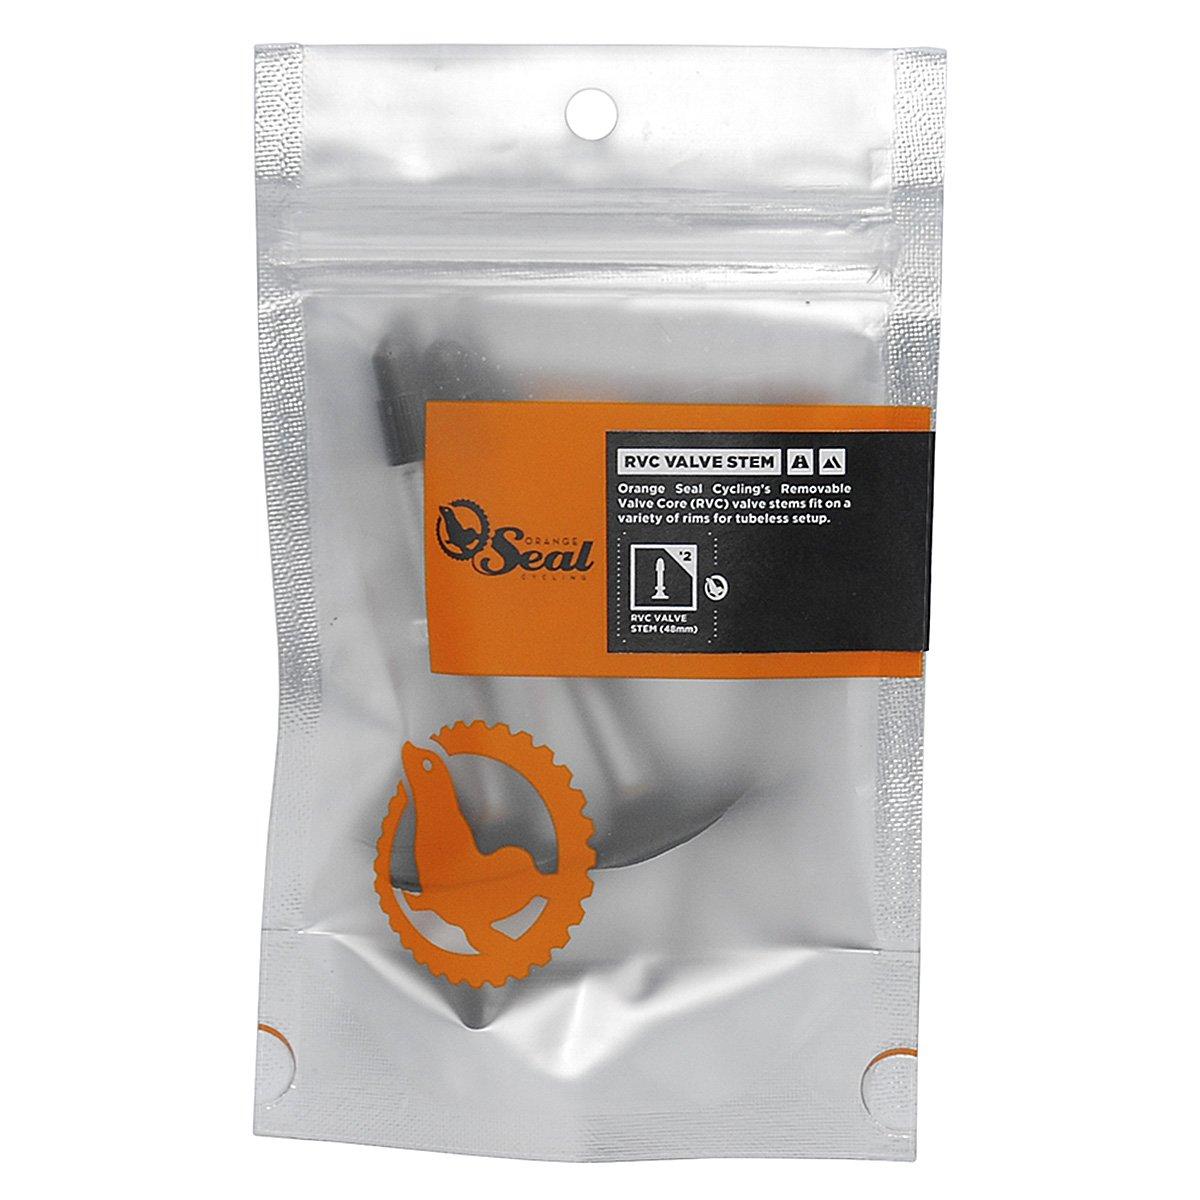 OrangeSealCycling RCV Presta Valve Stems, 80mm by OrangeSealCycling (Image #1)